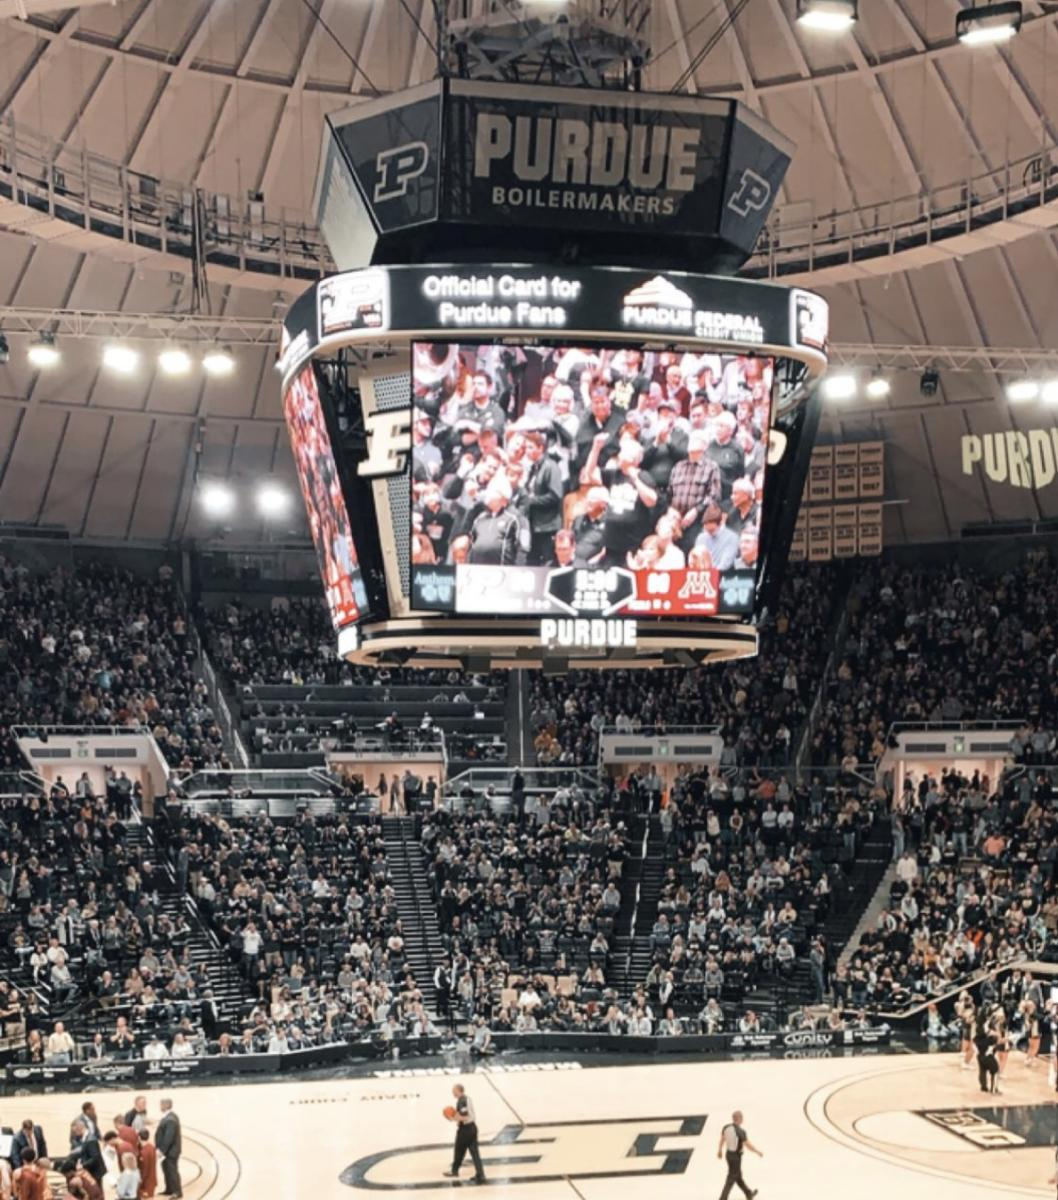 Purdue Mackey Arena